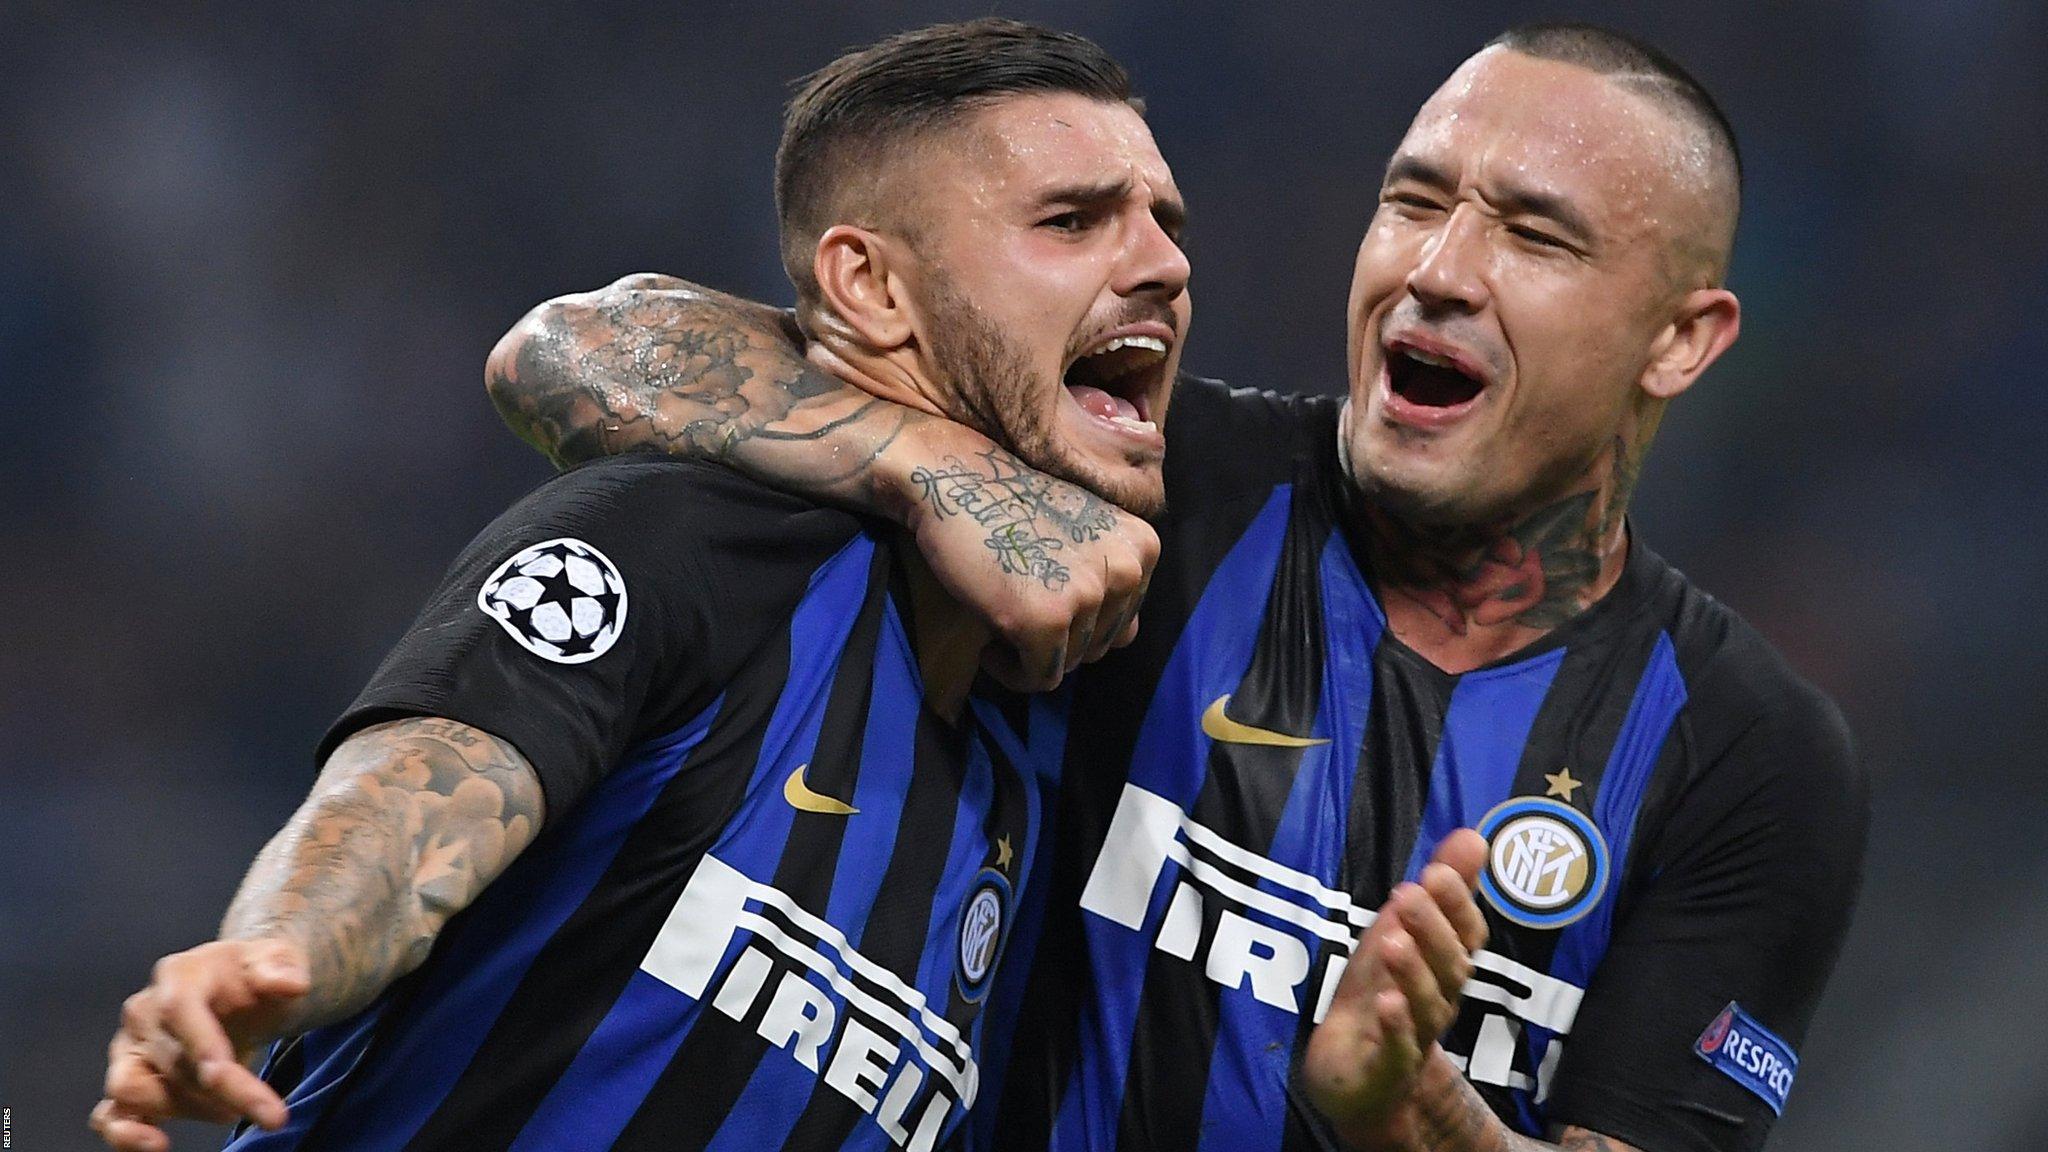 Inter Milan 2-1 Tottenham Hotspur: Inter stun Spurs with late fightback